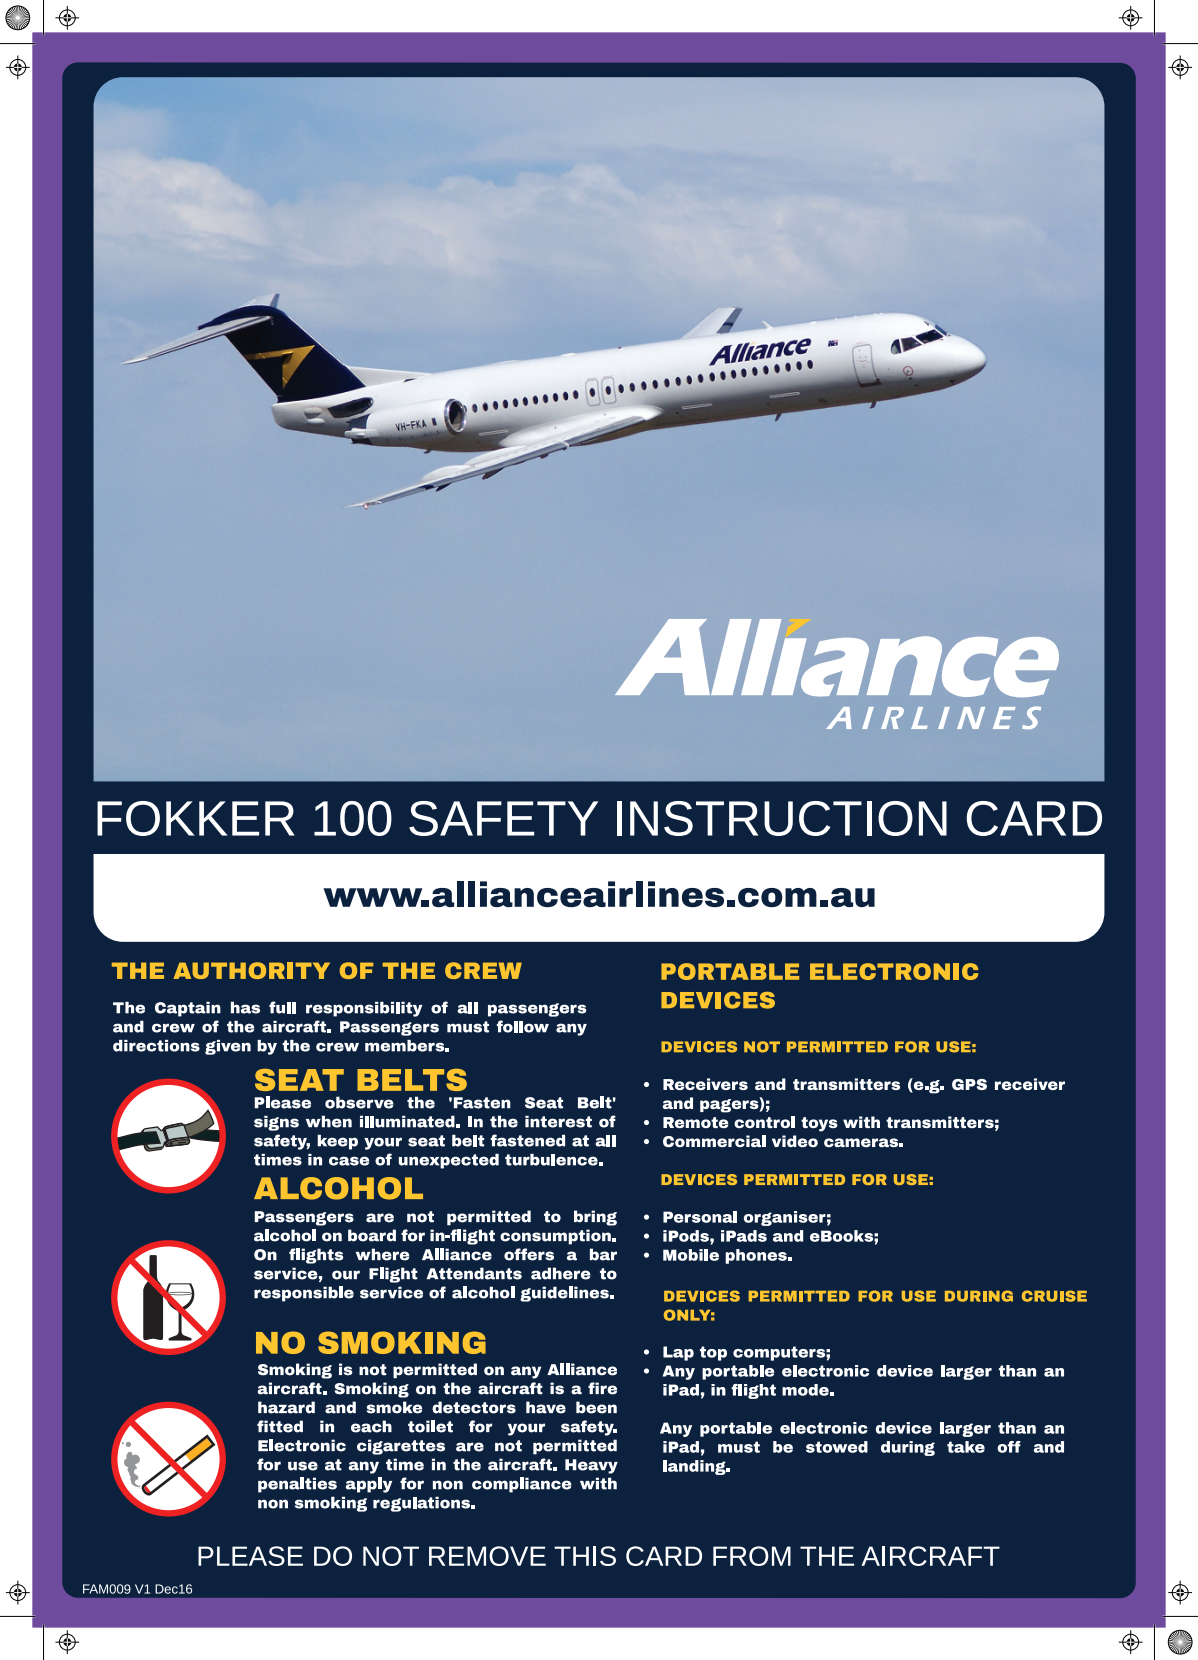 Passenger Safety Instruction Card F100